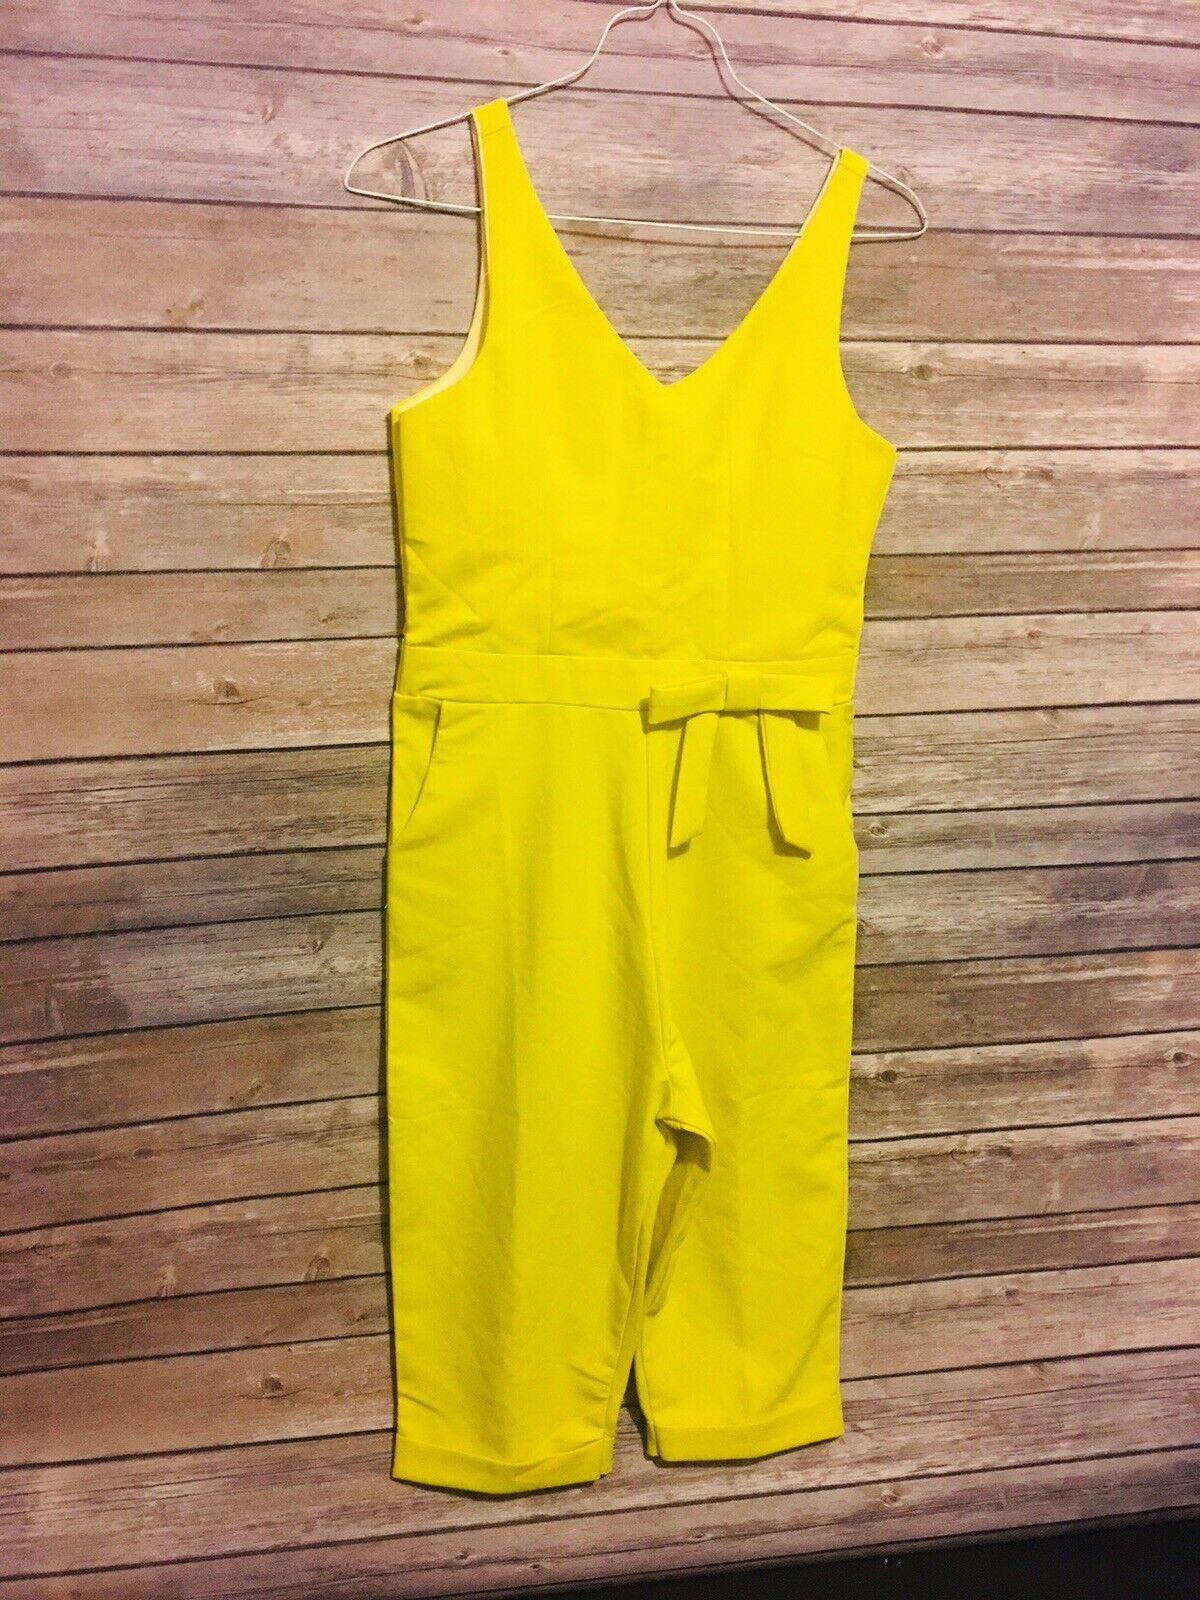 Womens Jumpsuit Capri Shorts Yellow Retro Romper With Bow Nice